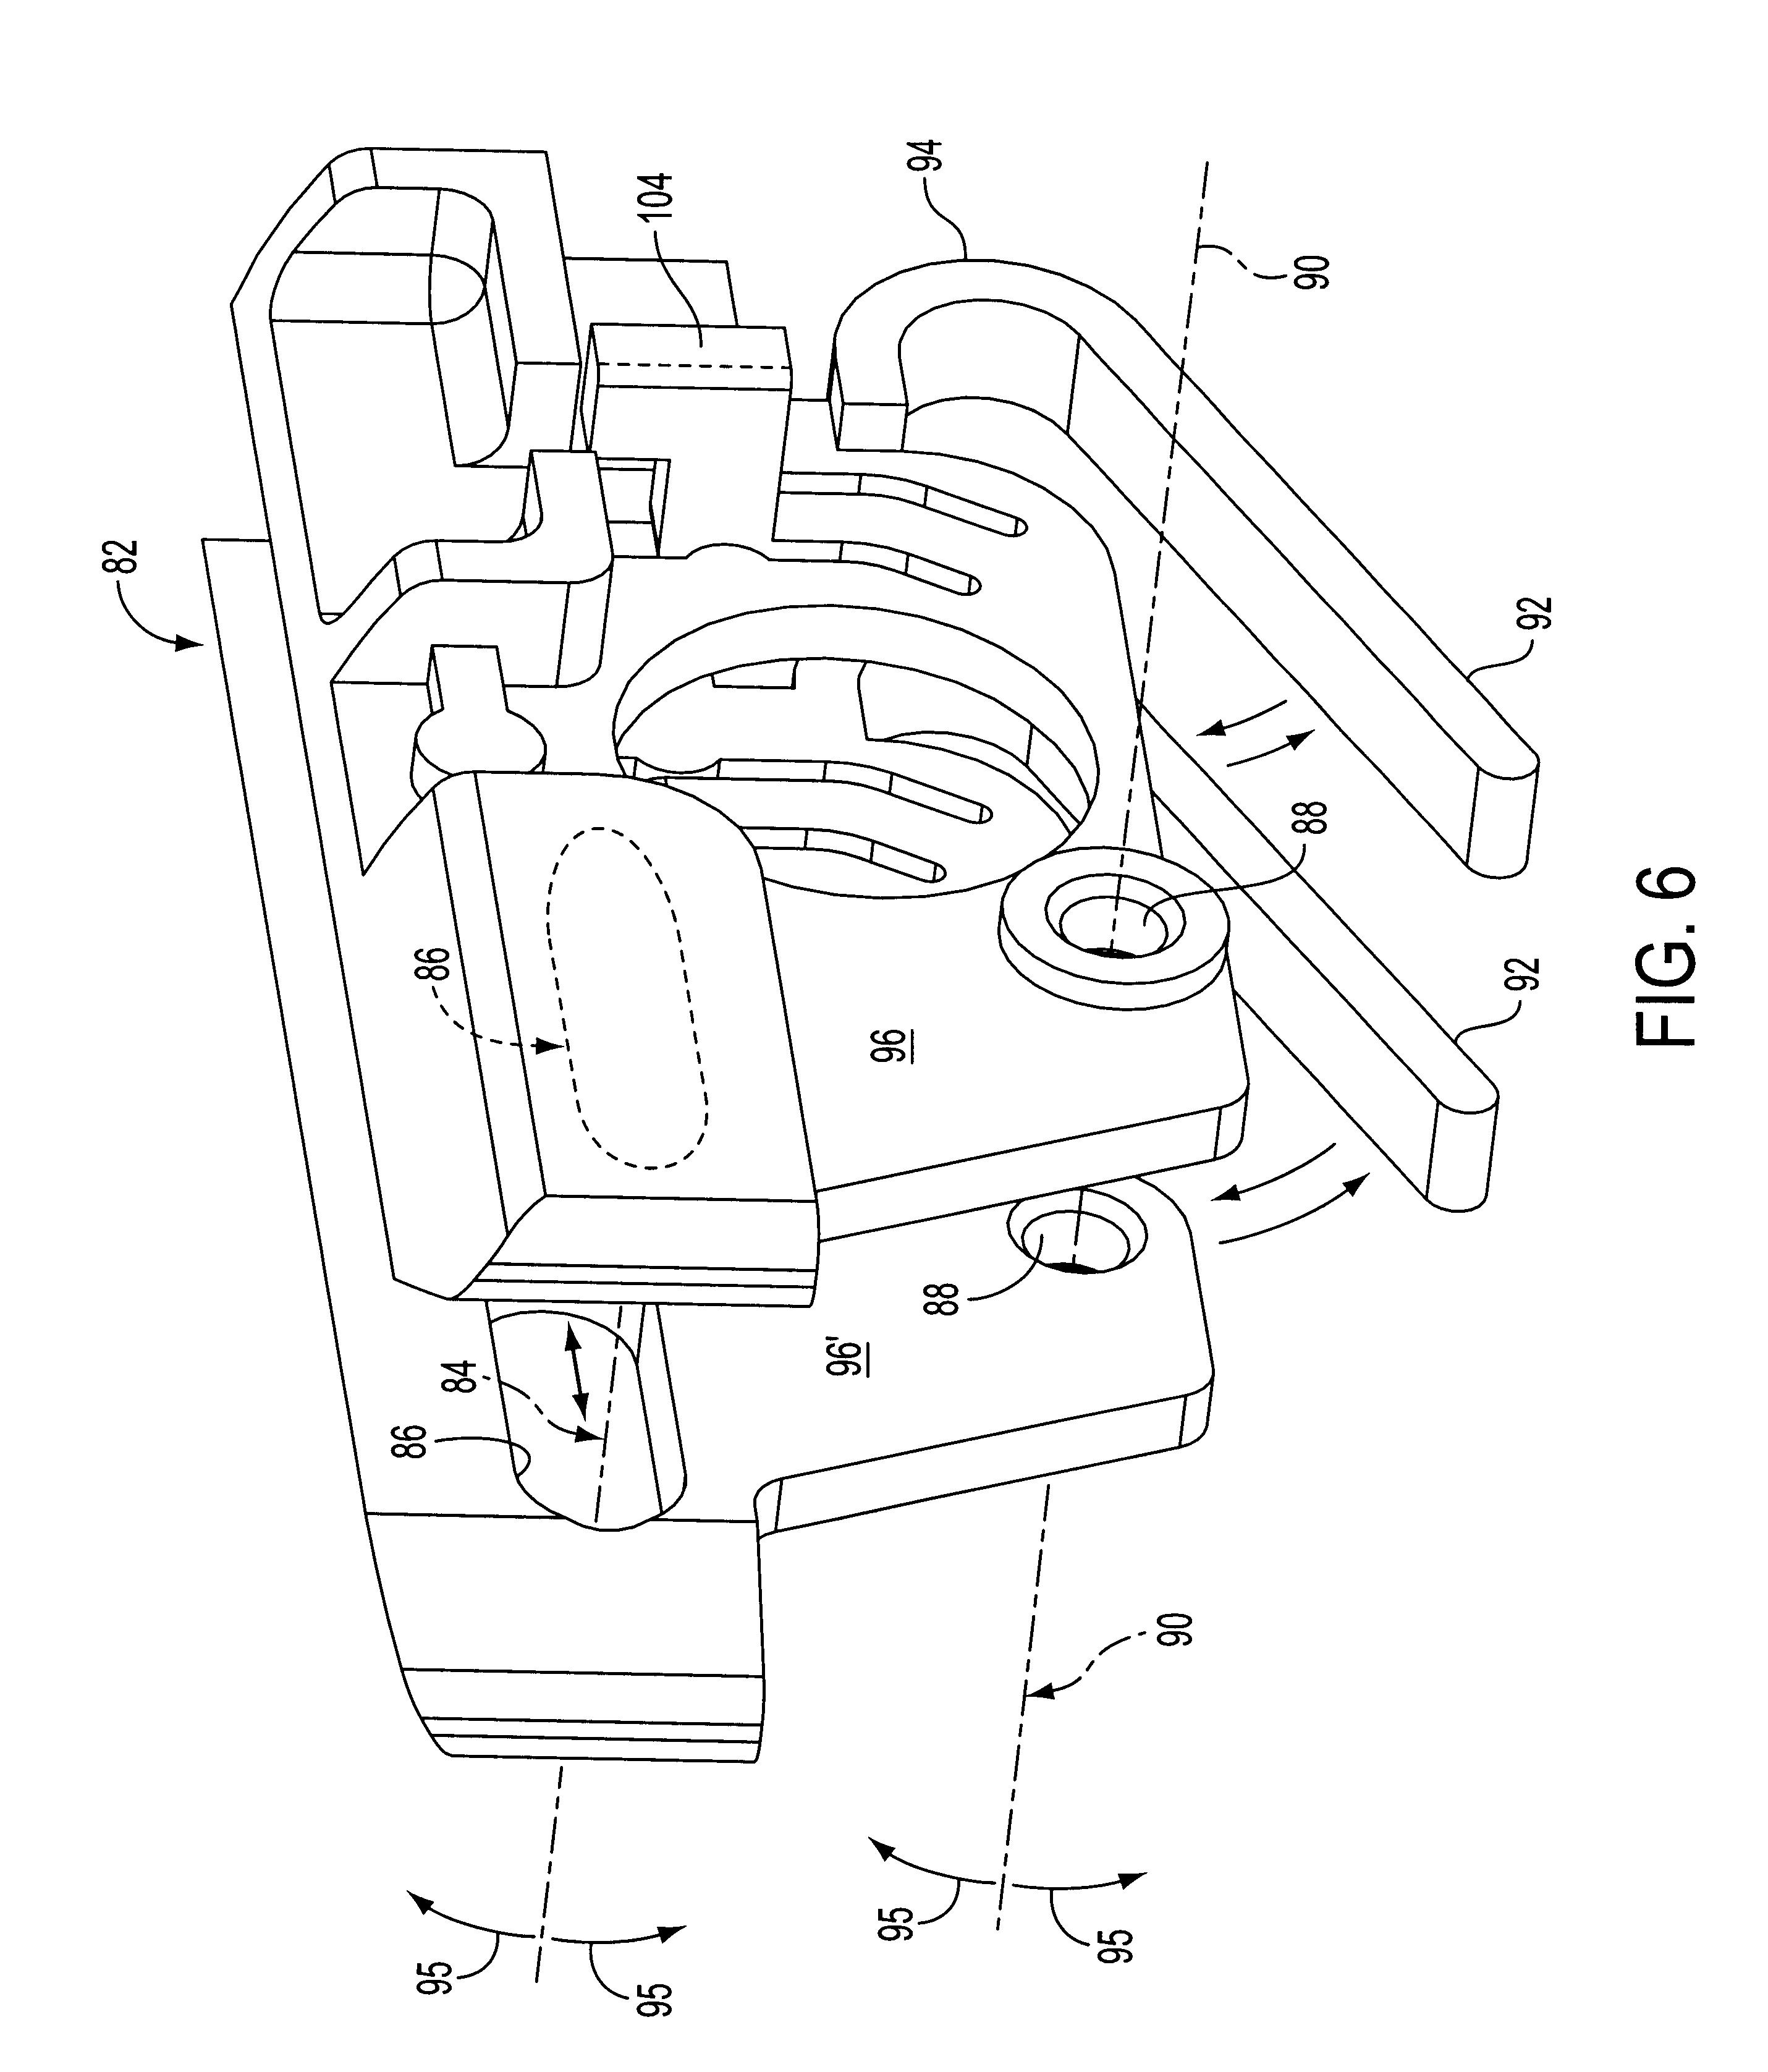 Master Lock Parts Diagram Best Secret Wiring Winch How Kwikset Locks Work Free Engine Image For Of A Inside